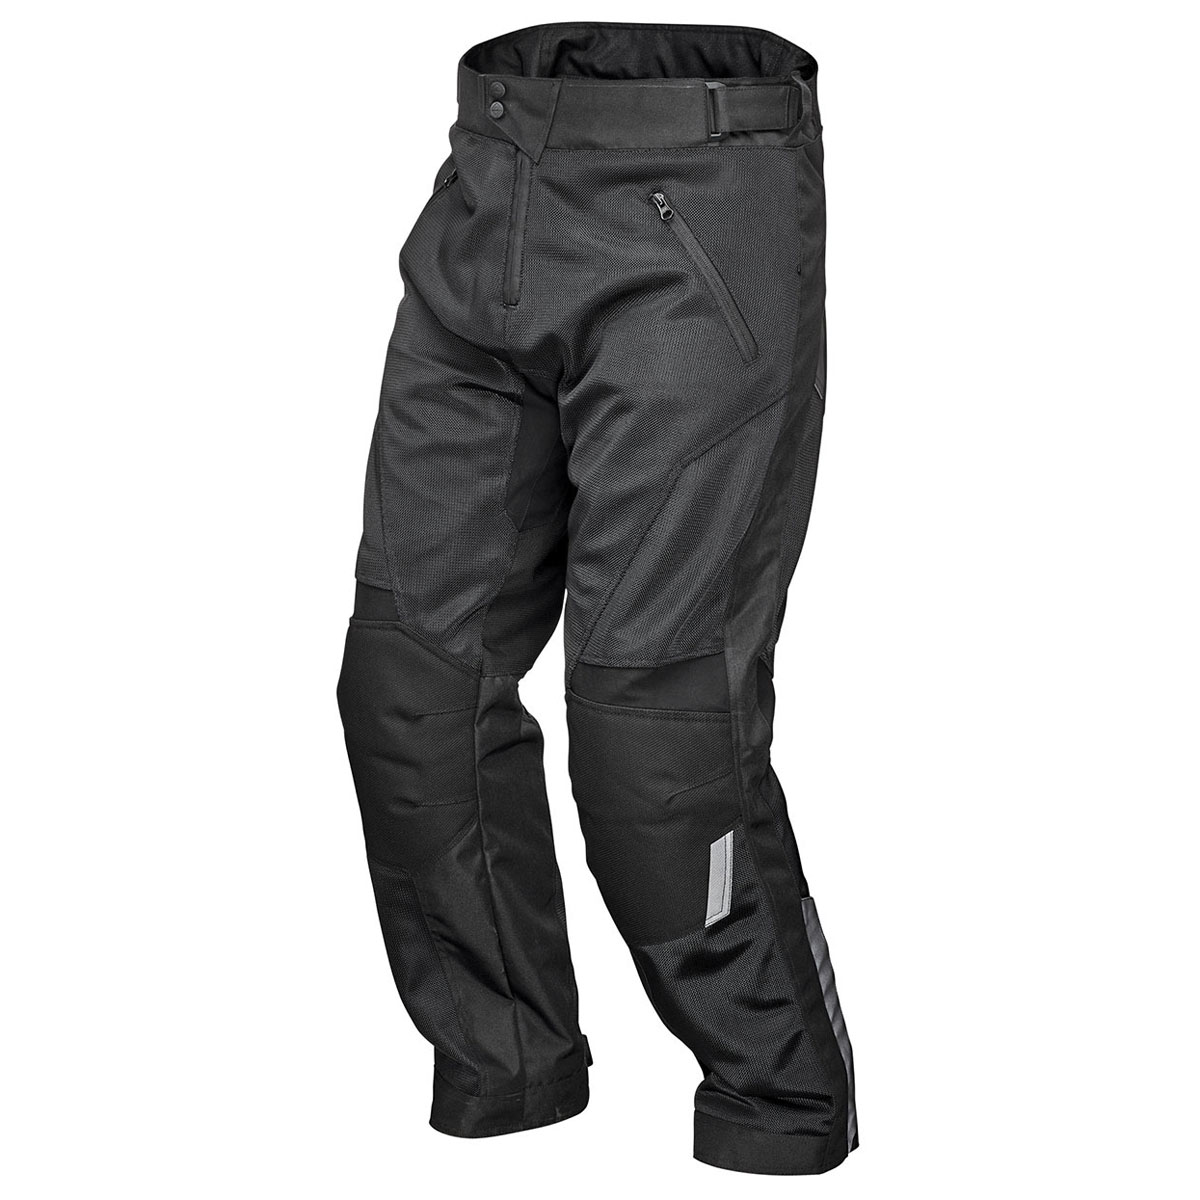 Firstgear Men's Rush Air Mesh Black Pants